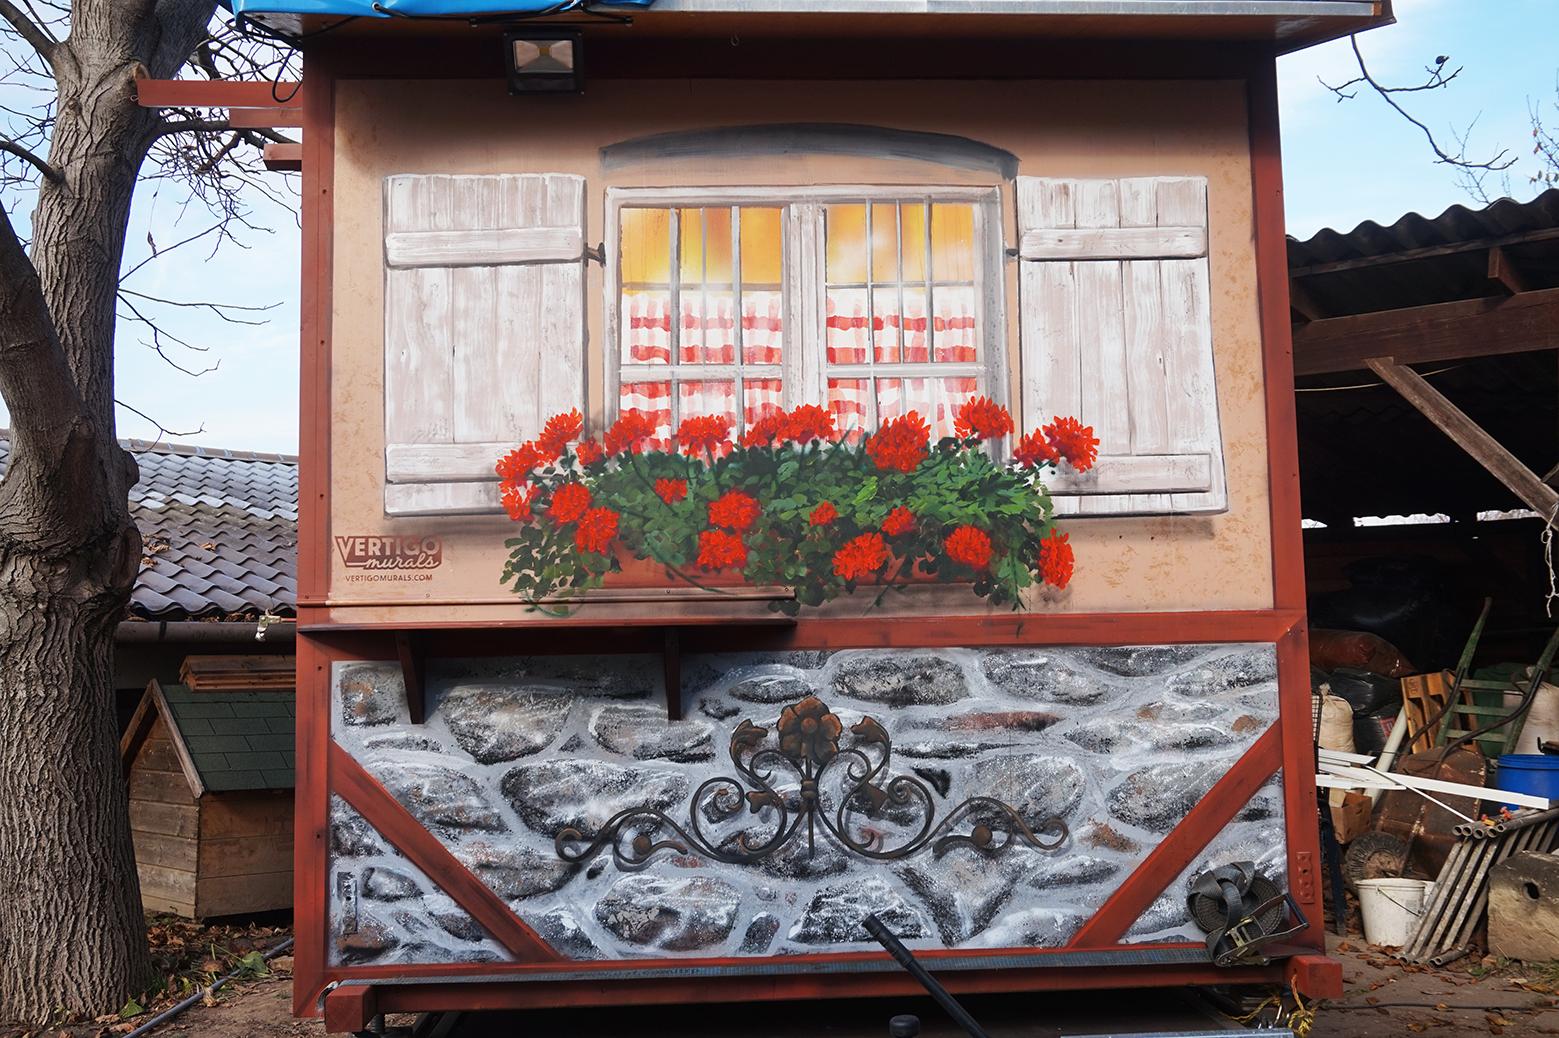 dekorációs falfestés vertigo murals  tűzfalfestés dekorfestés falfestmények3.jpg